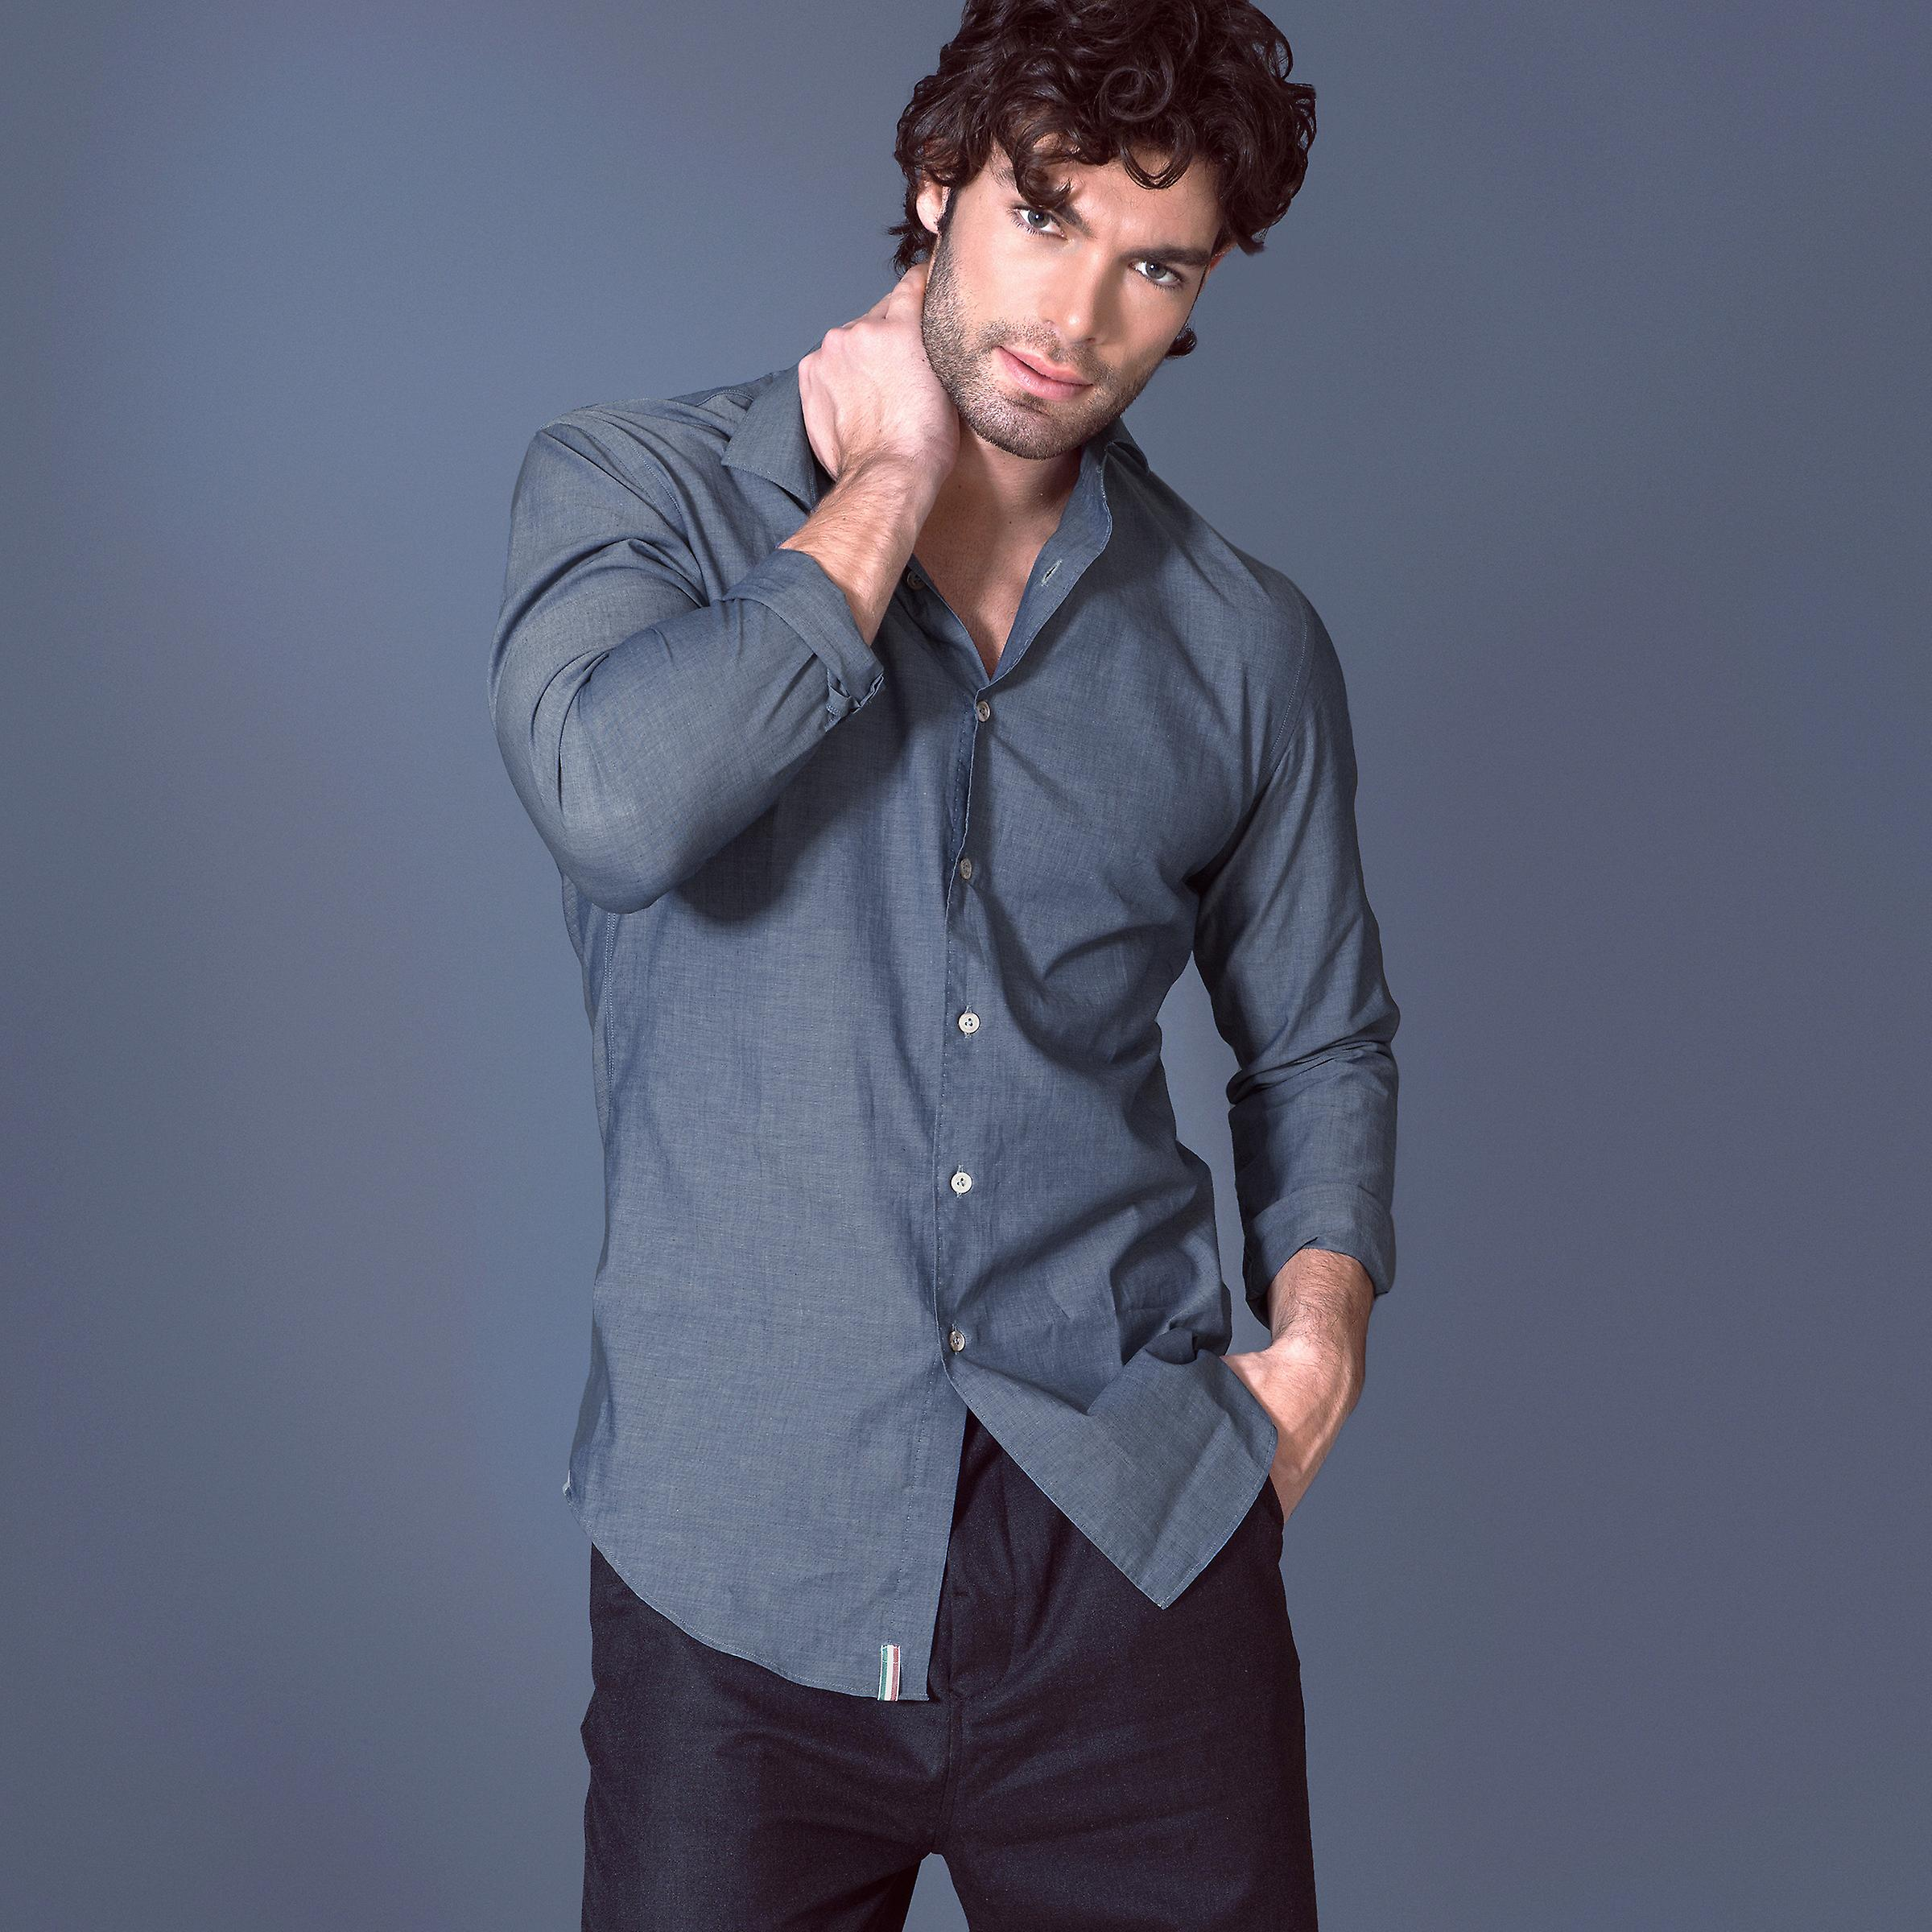 Fabio Giovanni Serrano Shirt - Mens High Quality Luxury Chambray Cotton Shirt